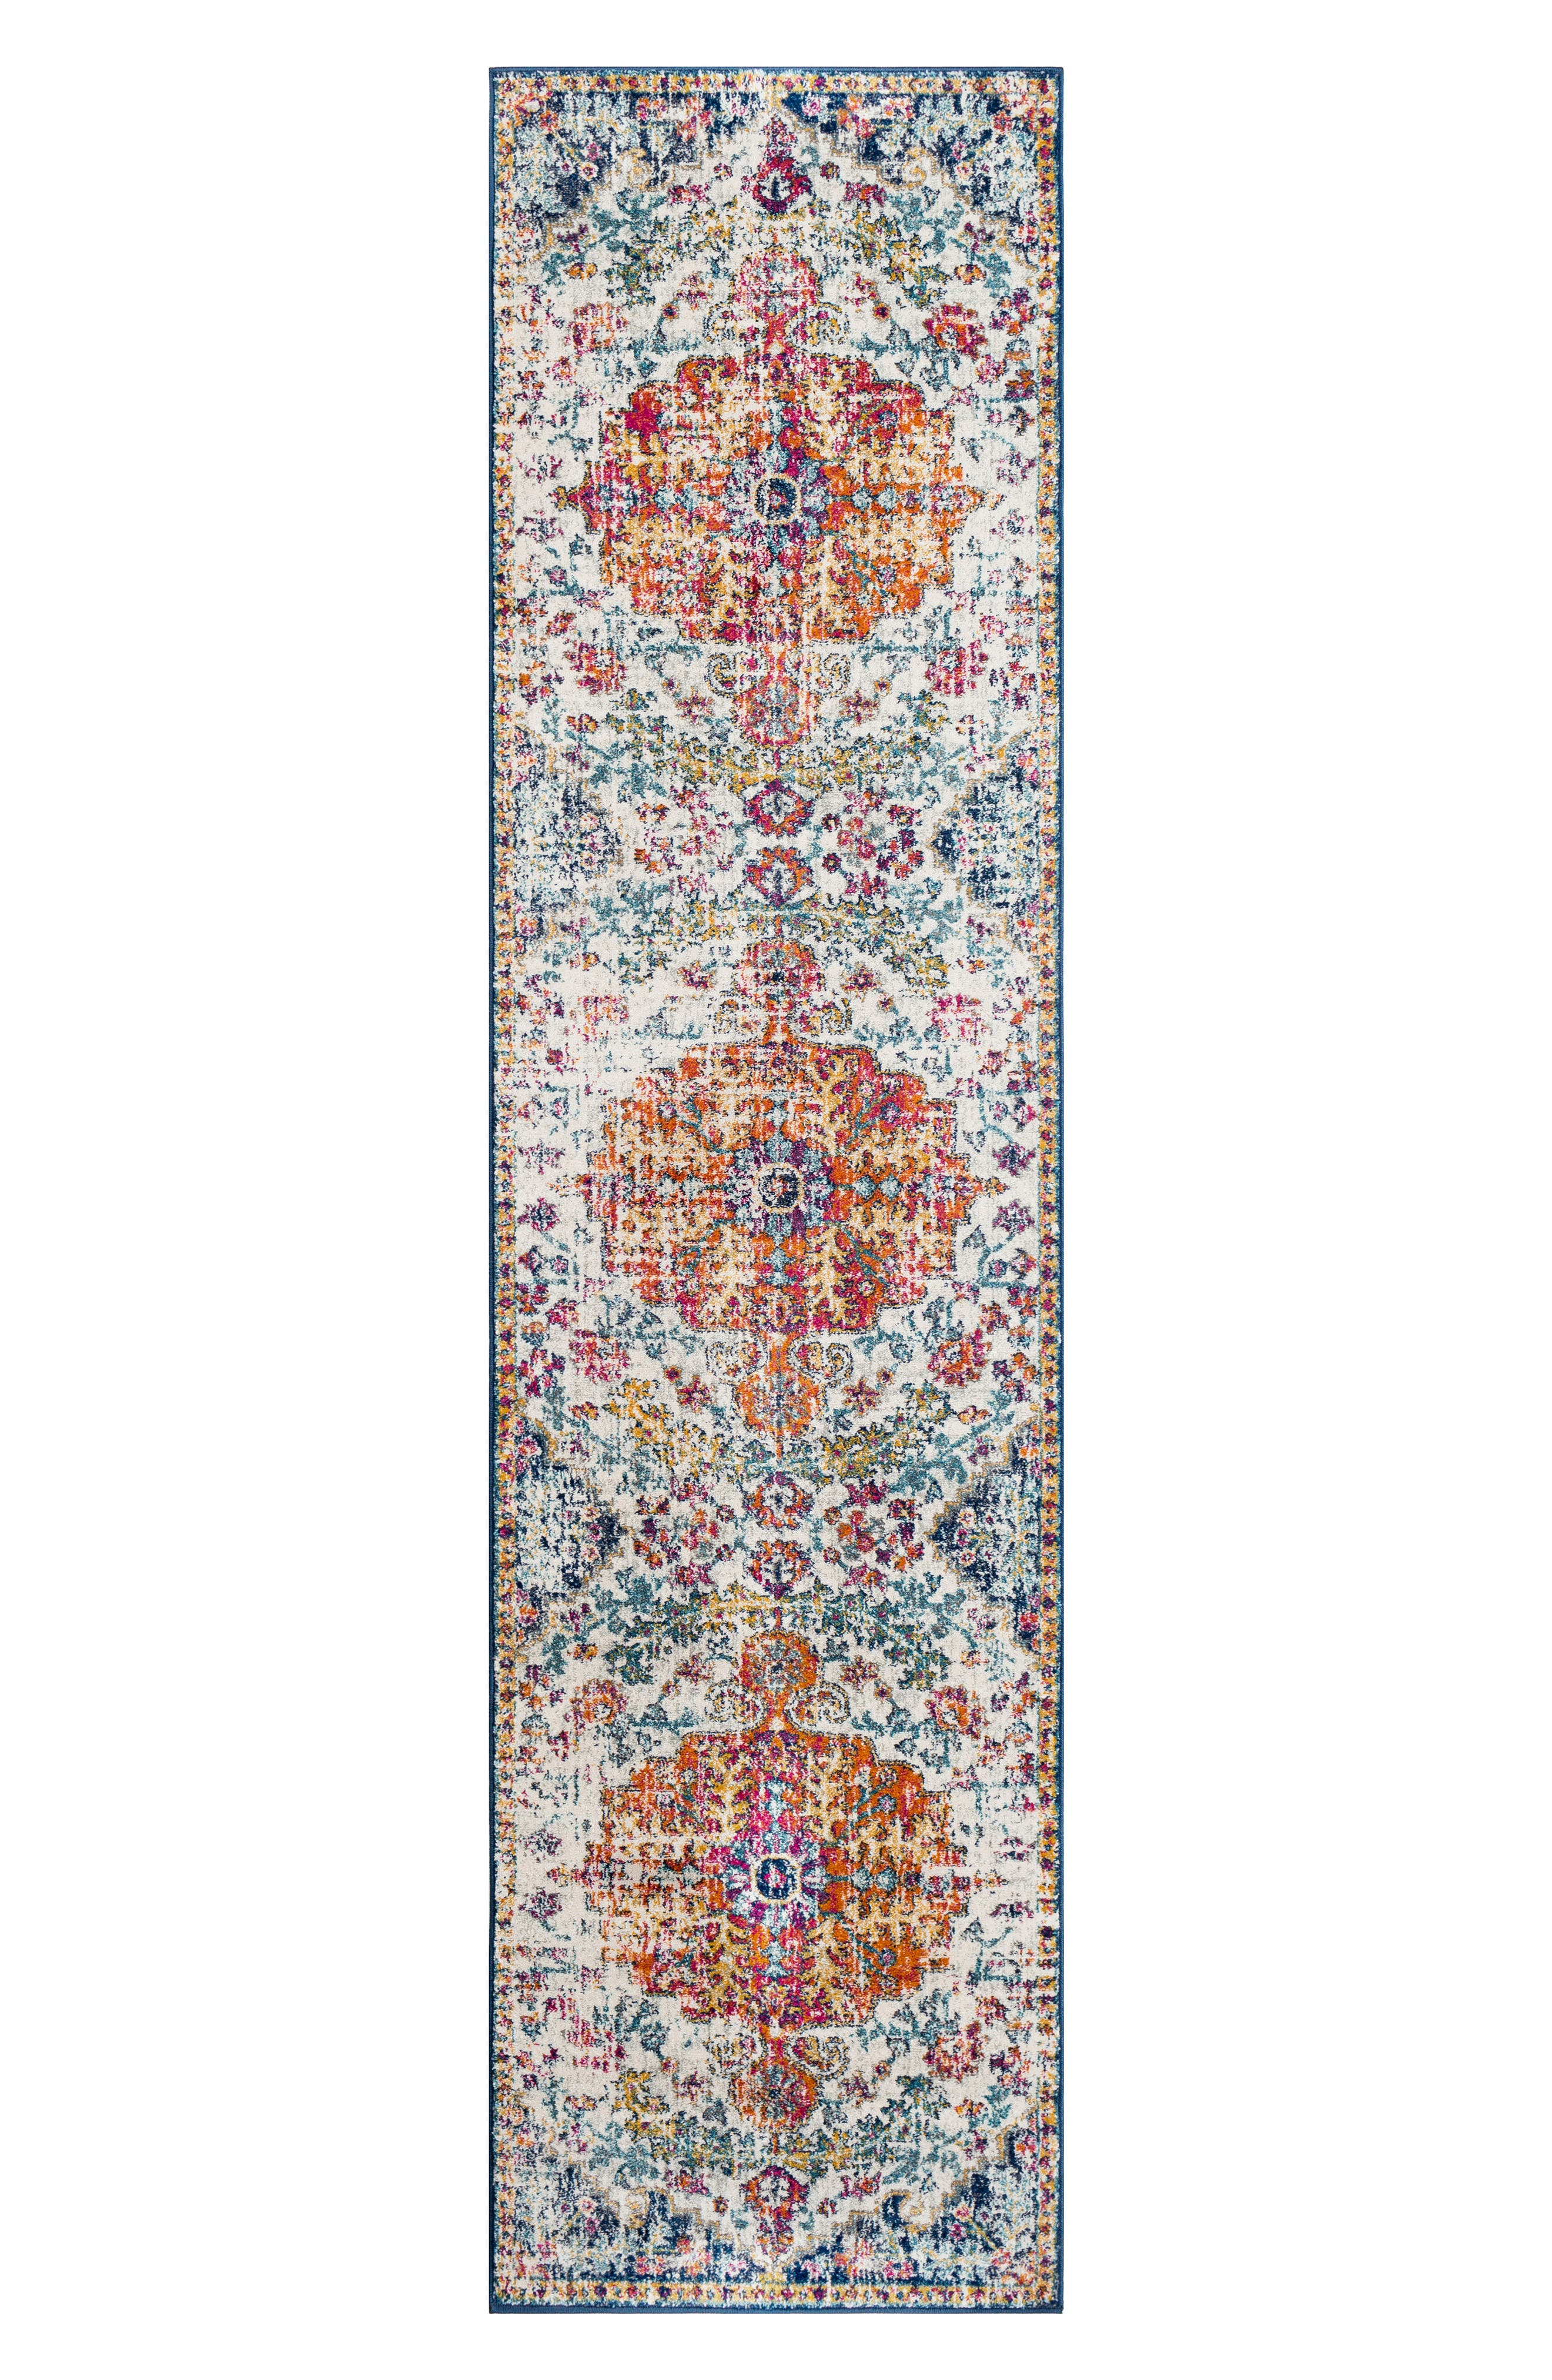 Harput Area Rug,                             Alternate thumbnail 3, color,                             YELLOW